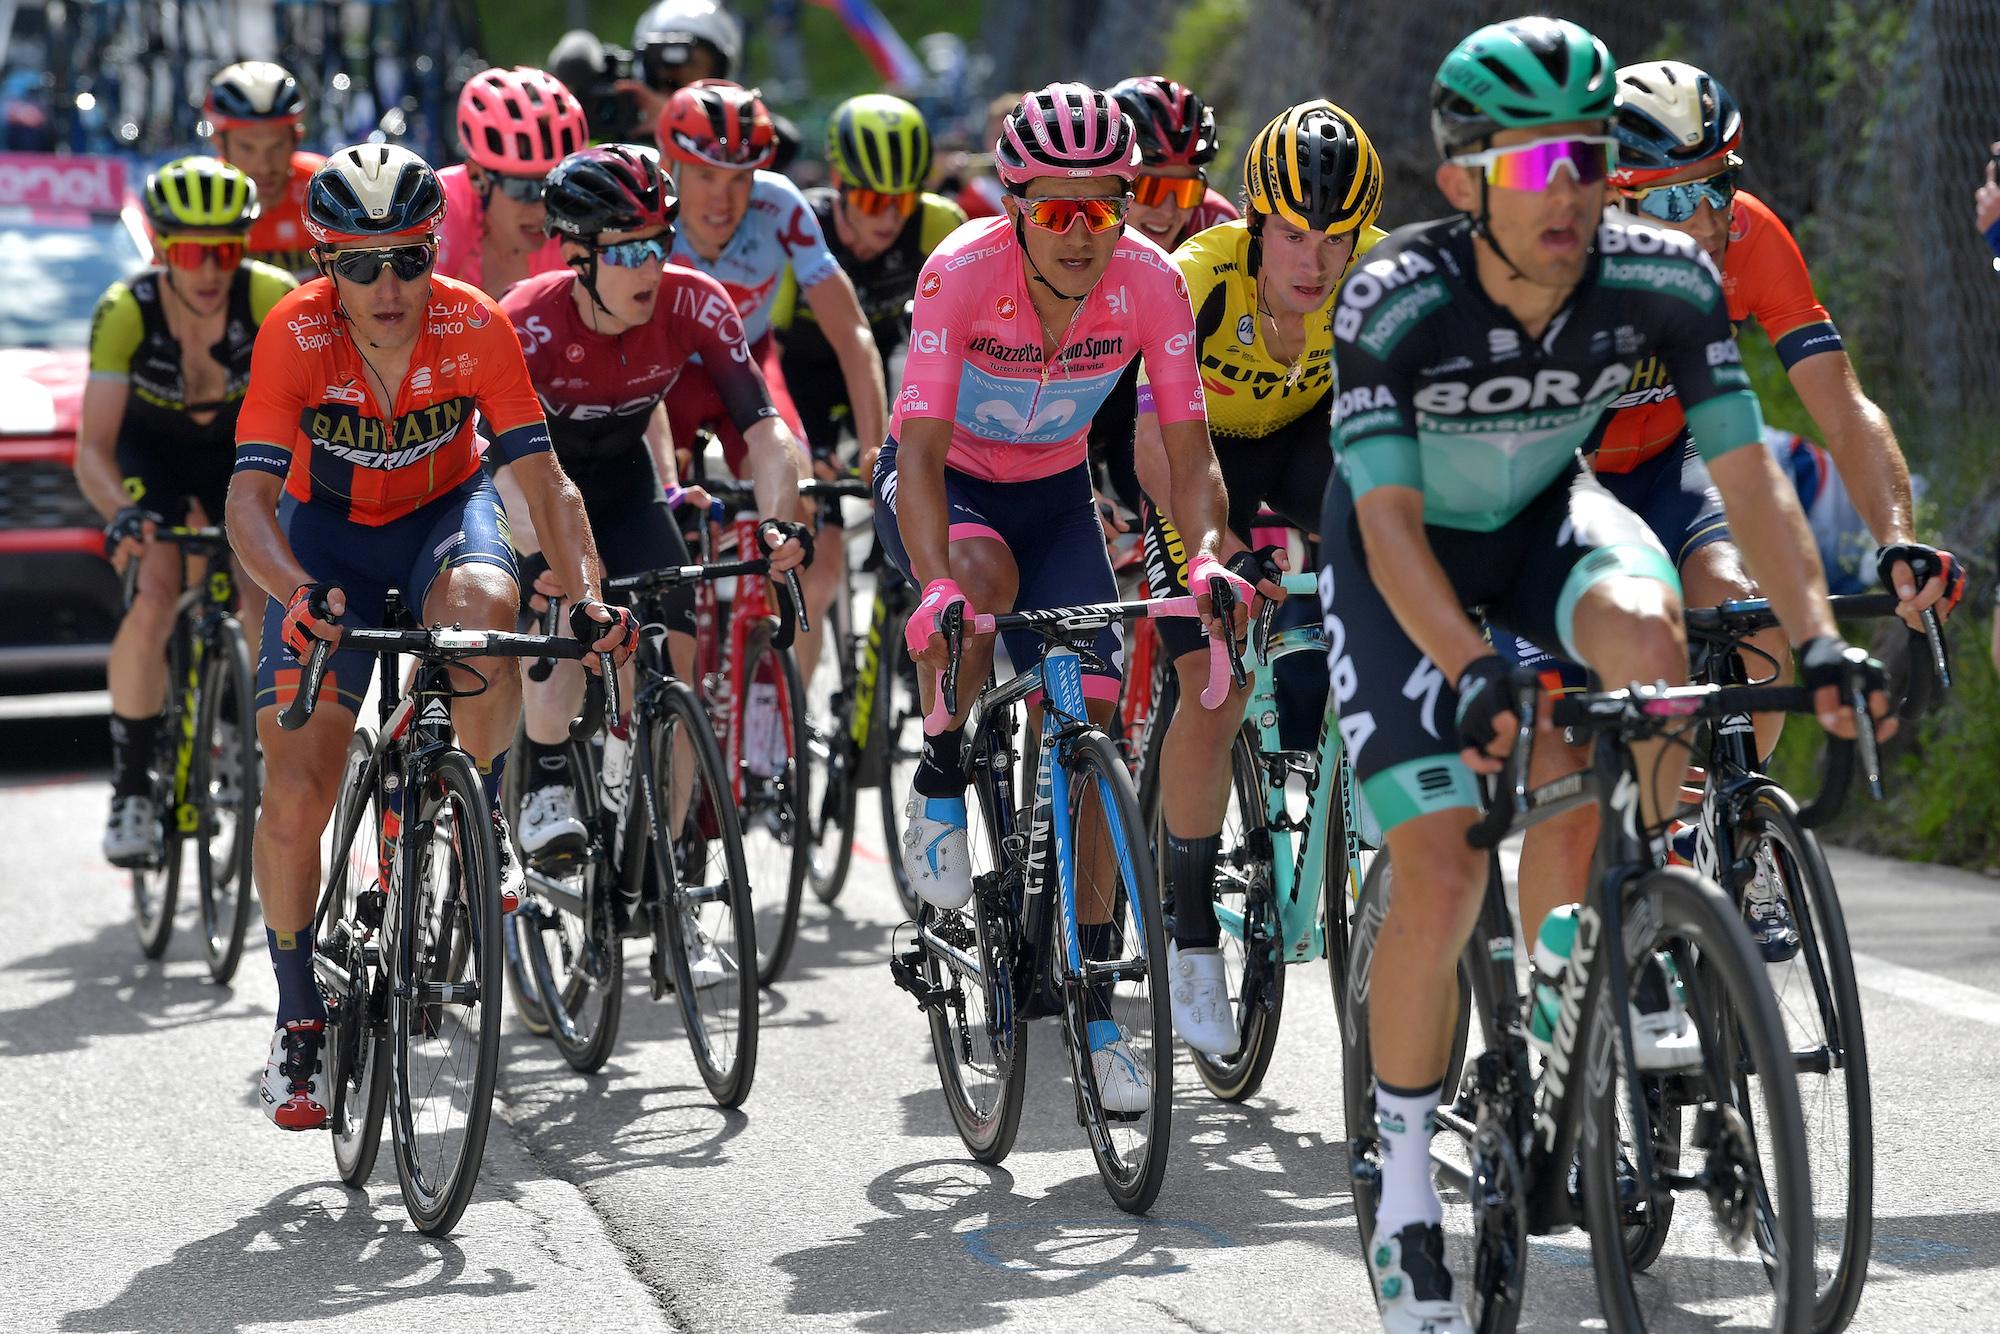 Giro d'Italia 2019 ratings: How did each team perform?